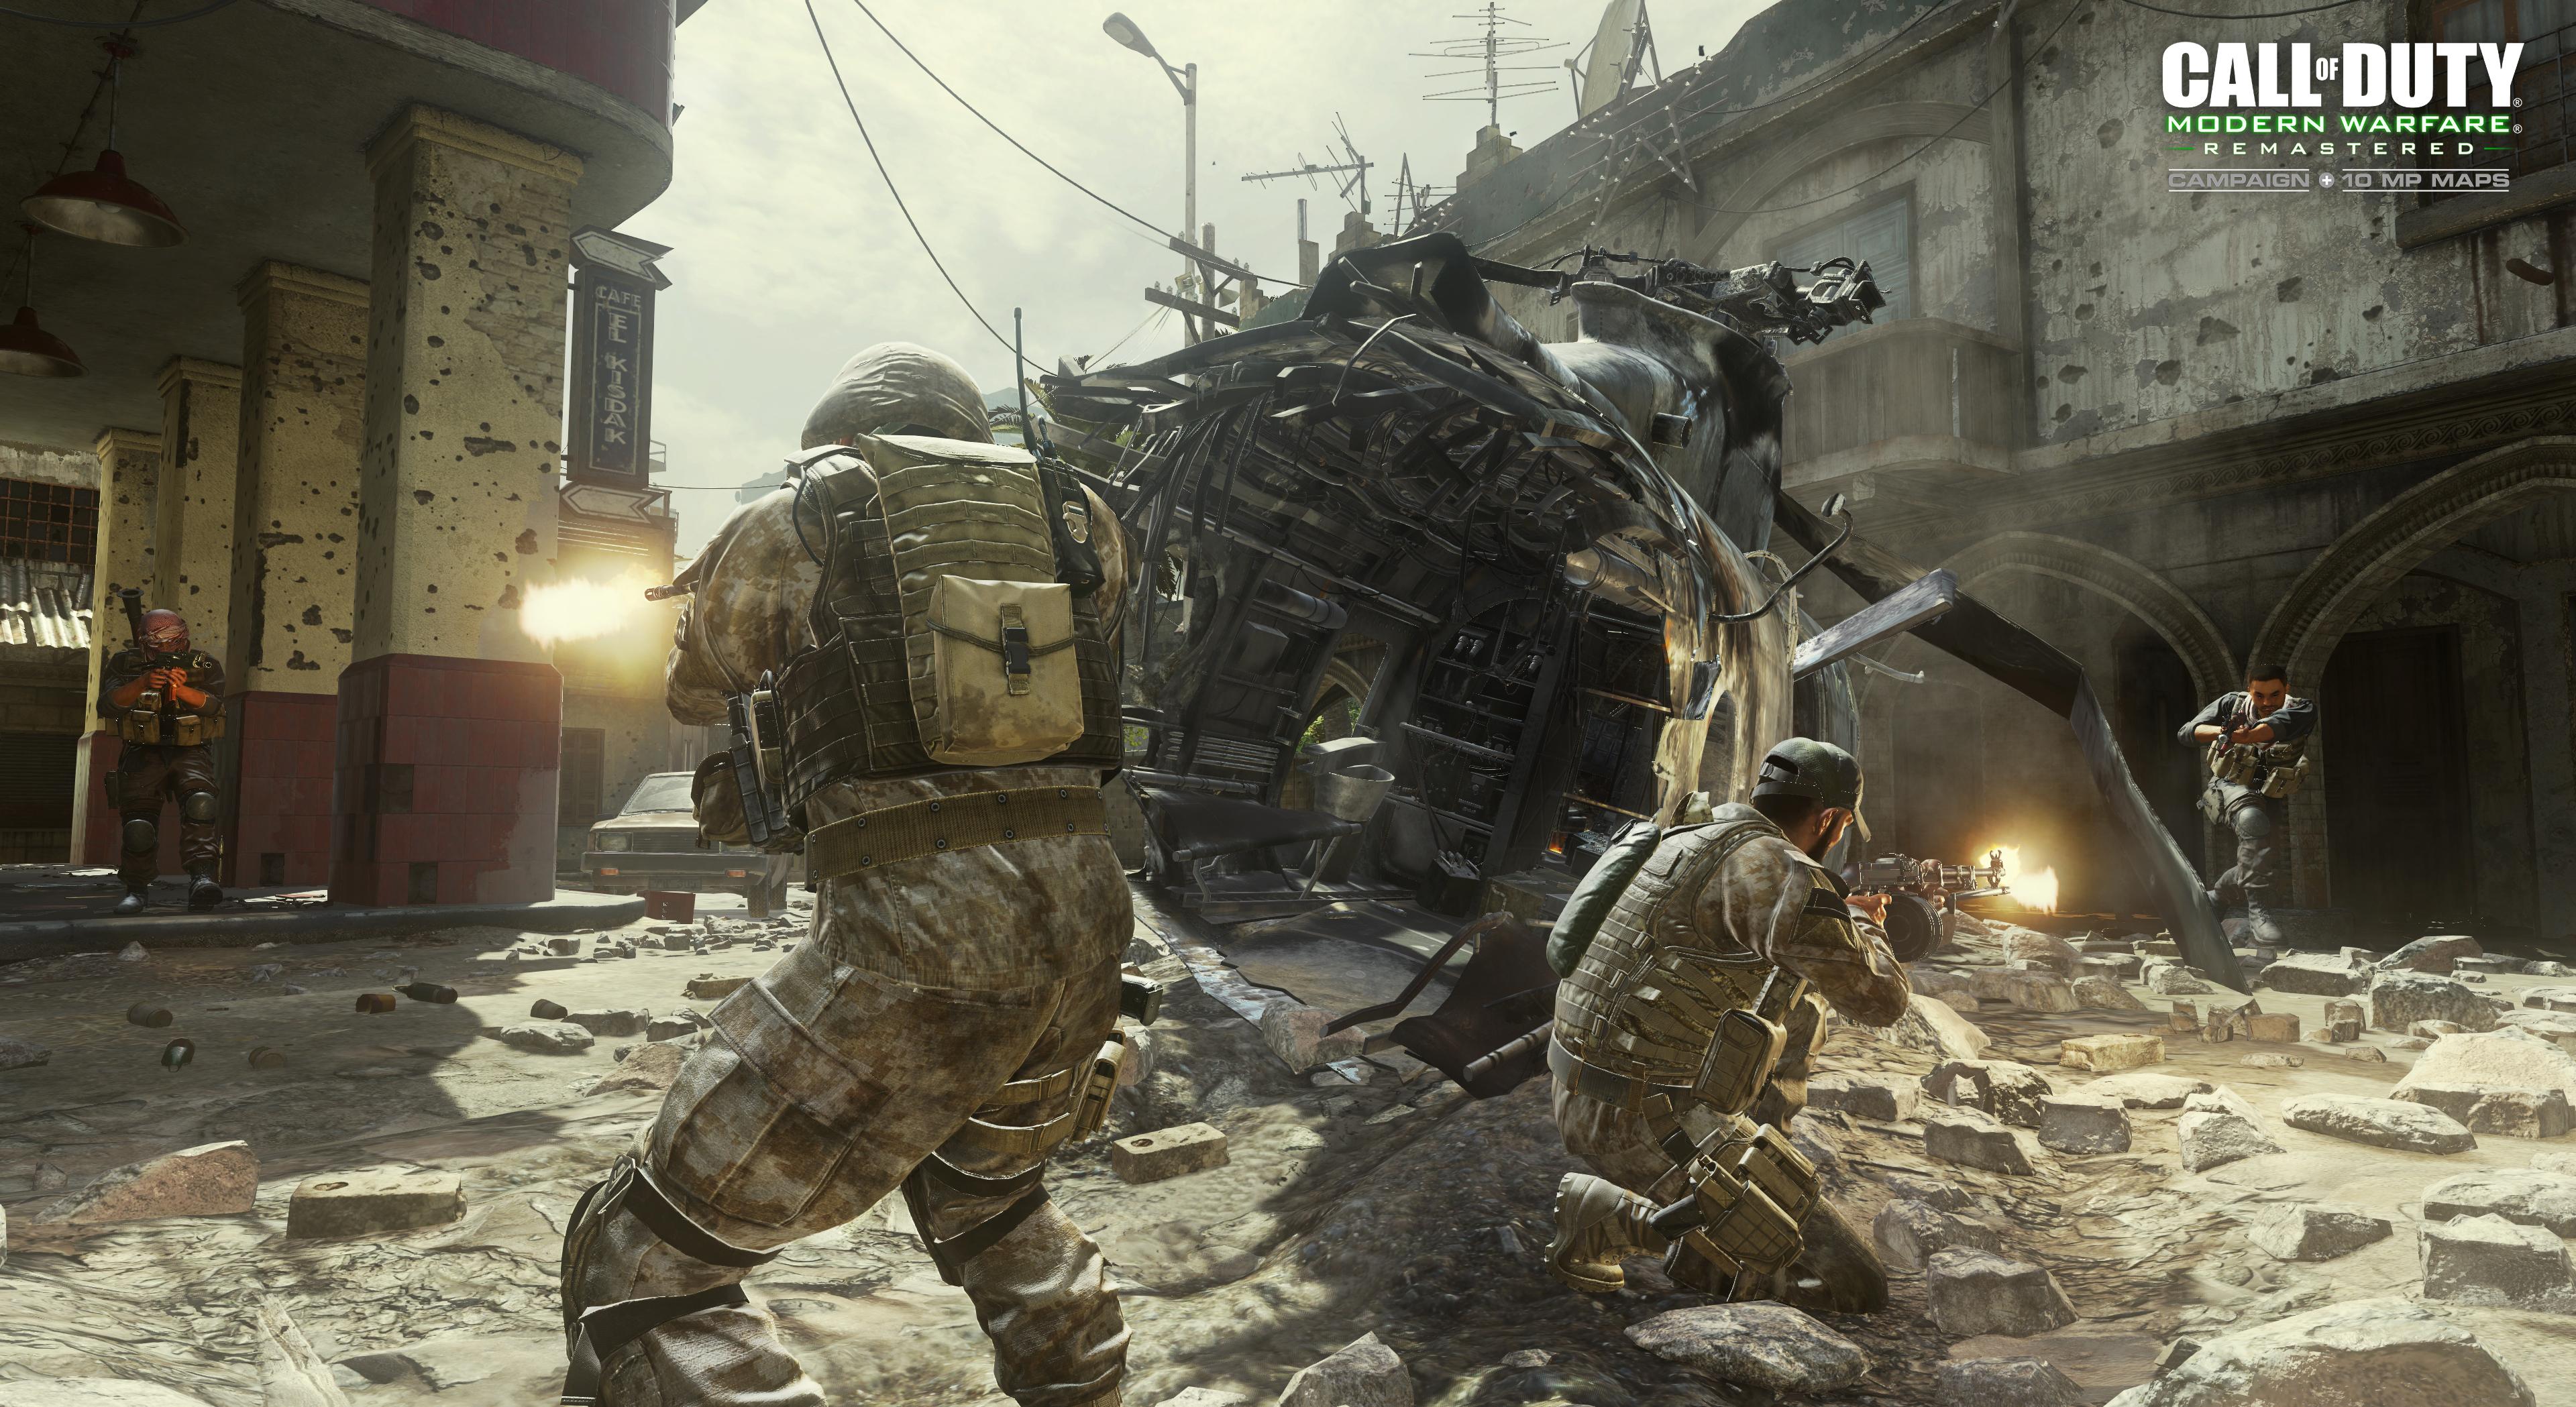 Download Call Of Duty 4 Wallpaper Hd